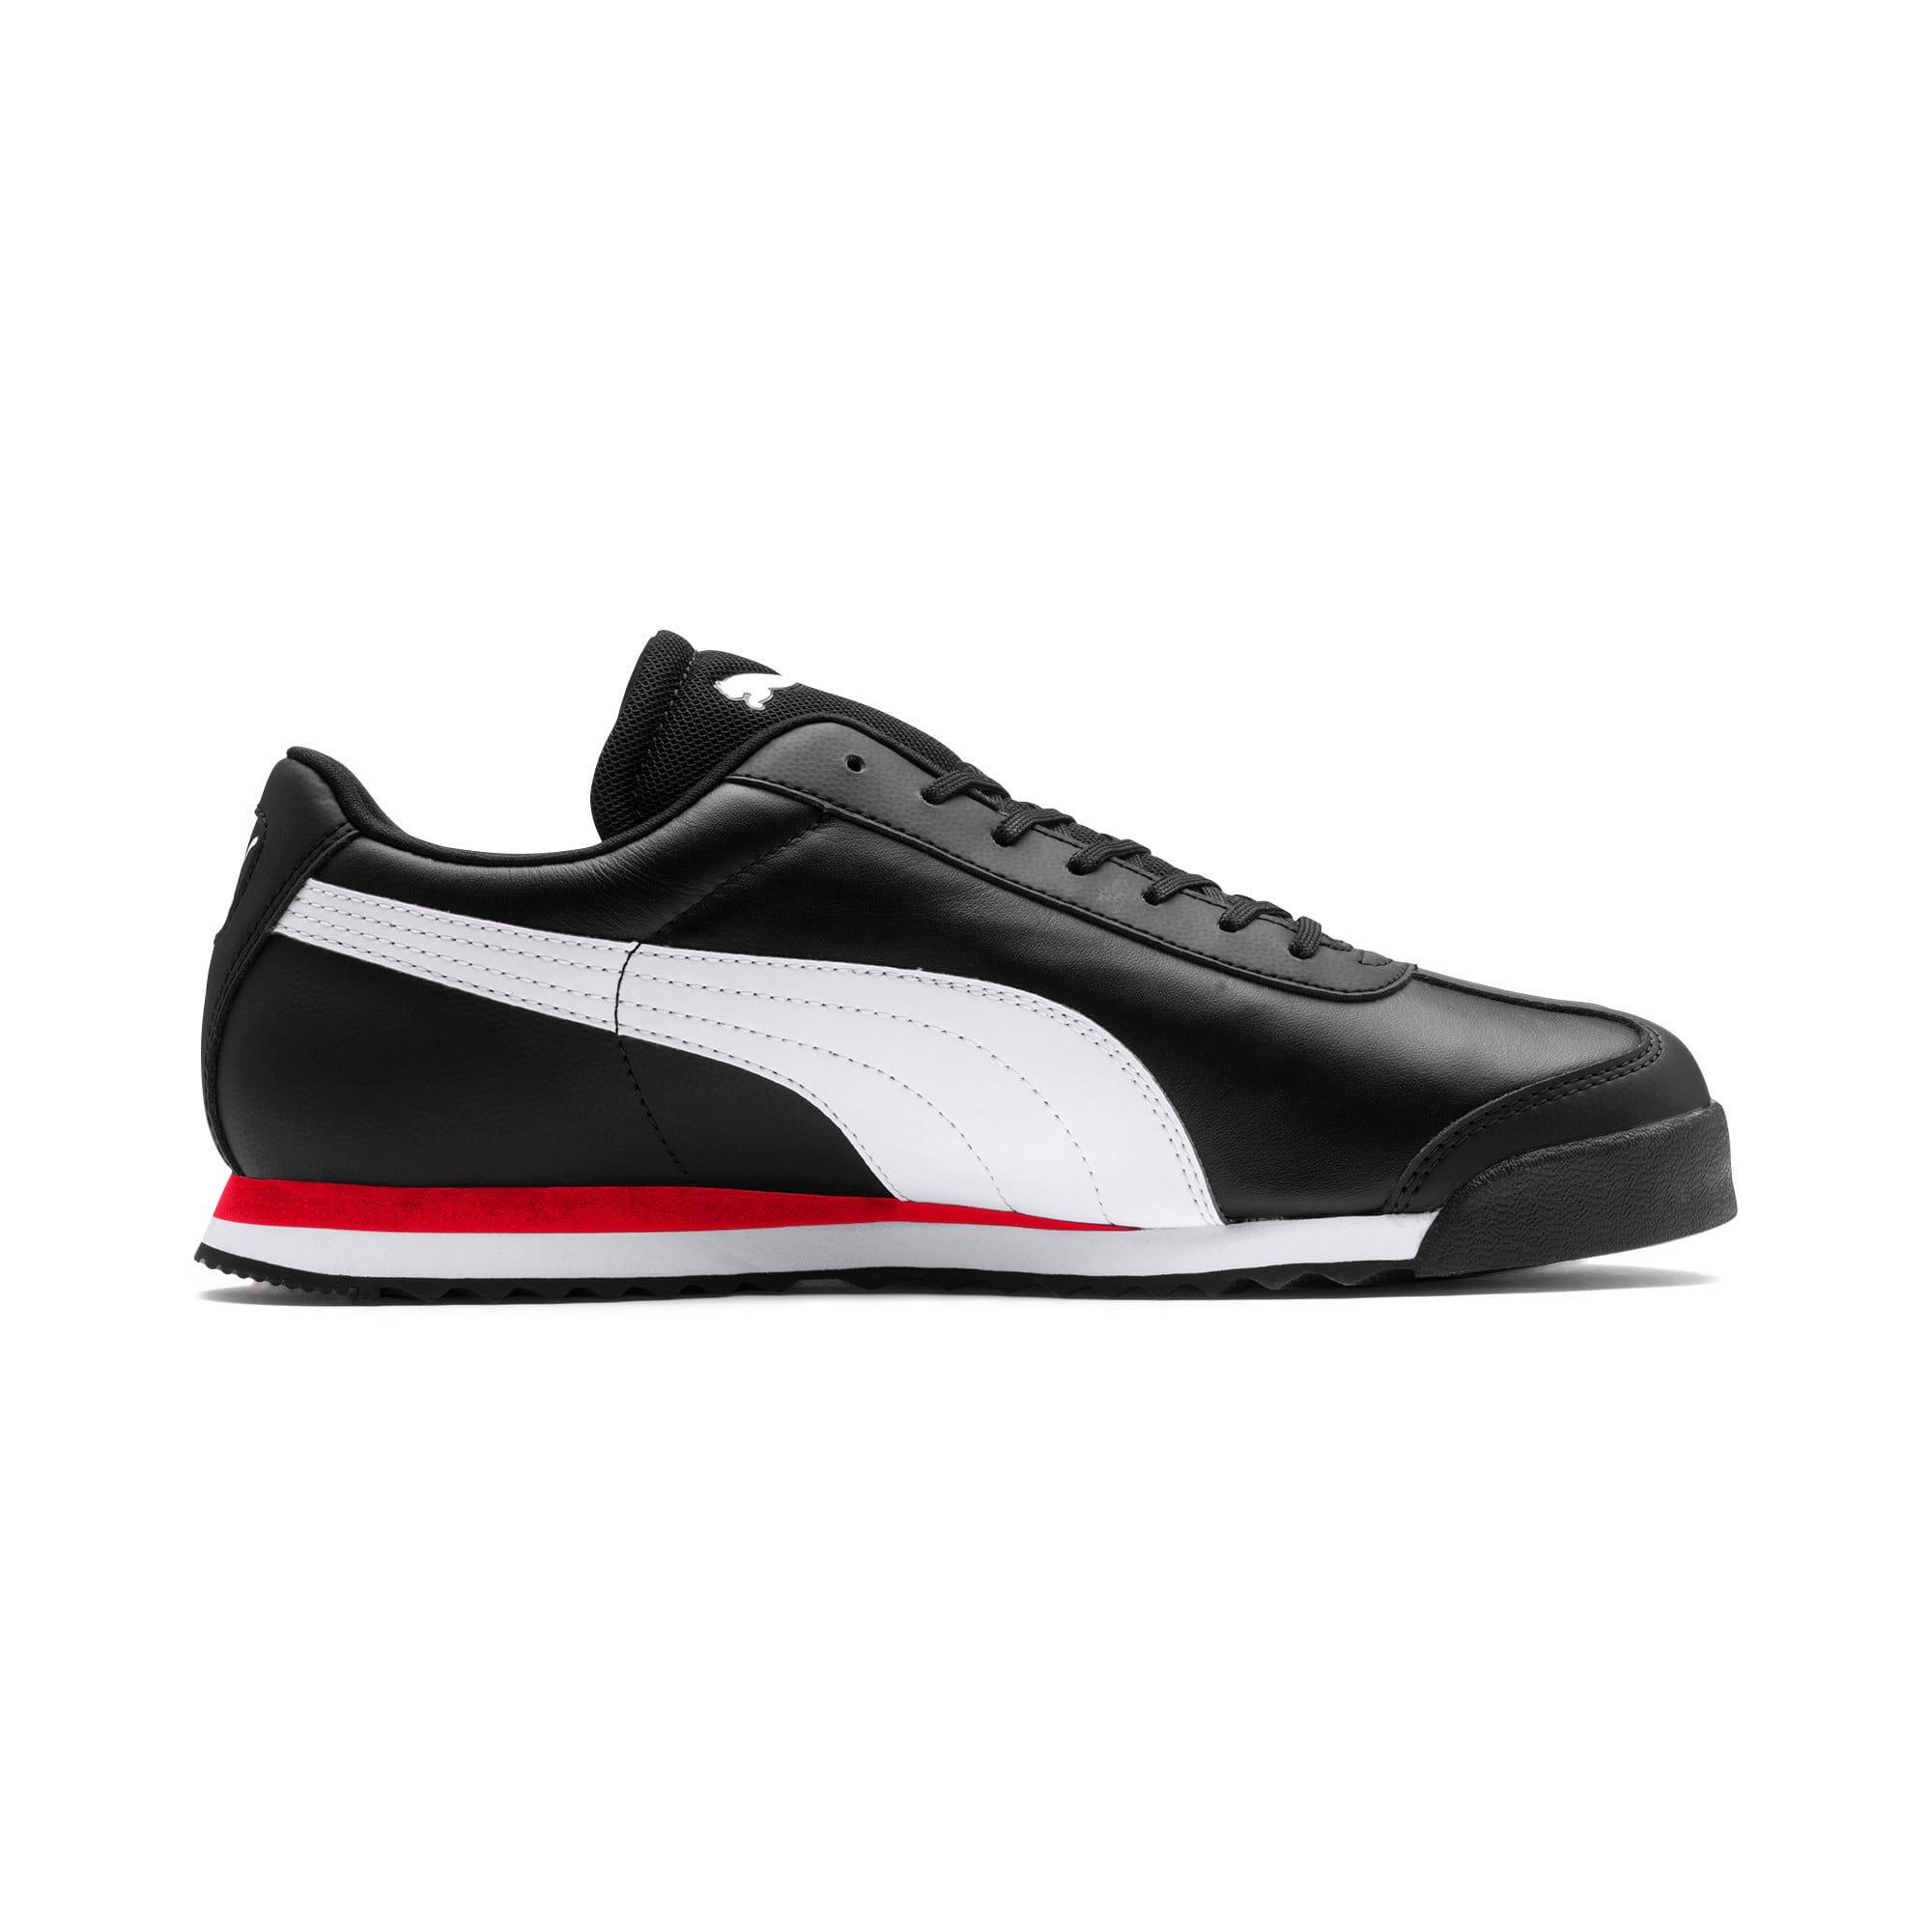 Thumbnail 6 of Scuderia Ferrari Roma Men's Sneakers, Black-White-Rosso Corsa, medium